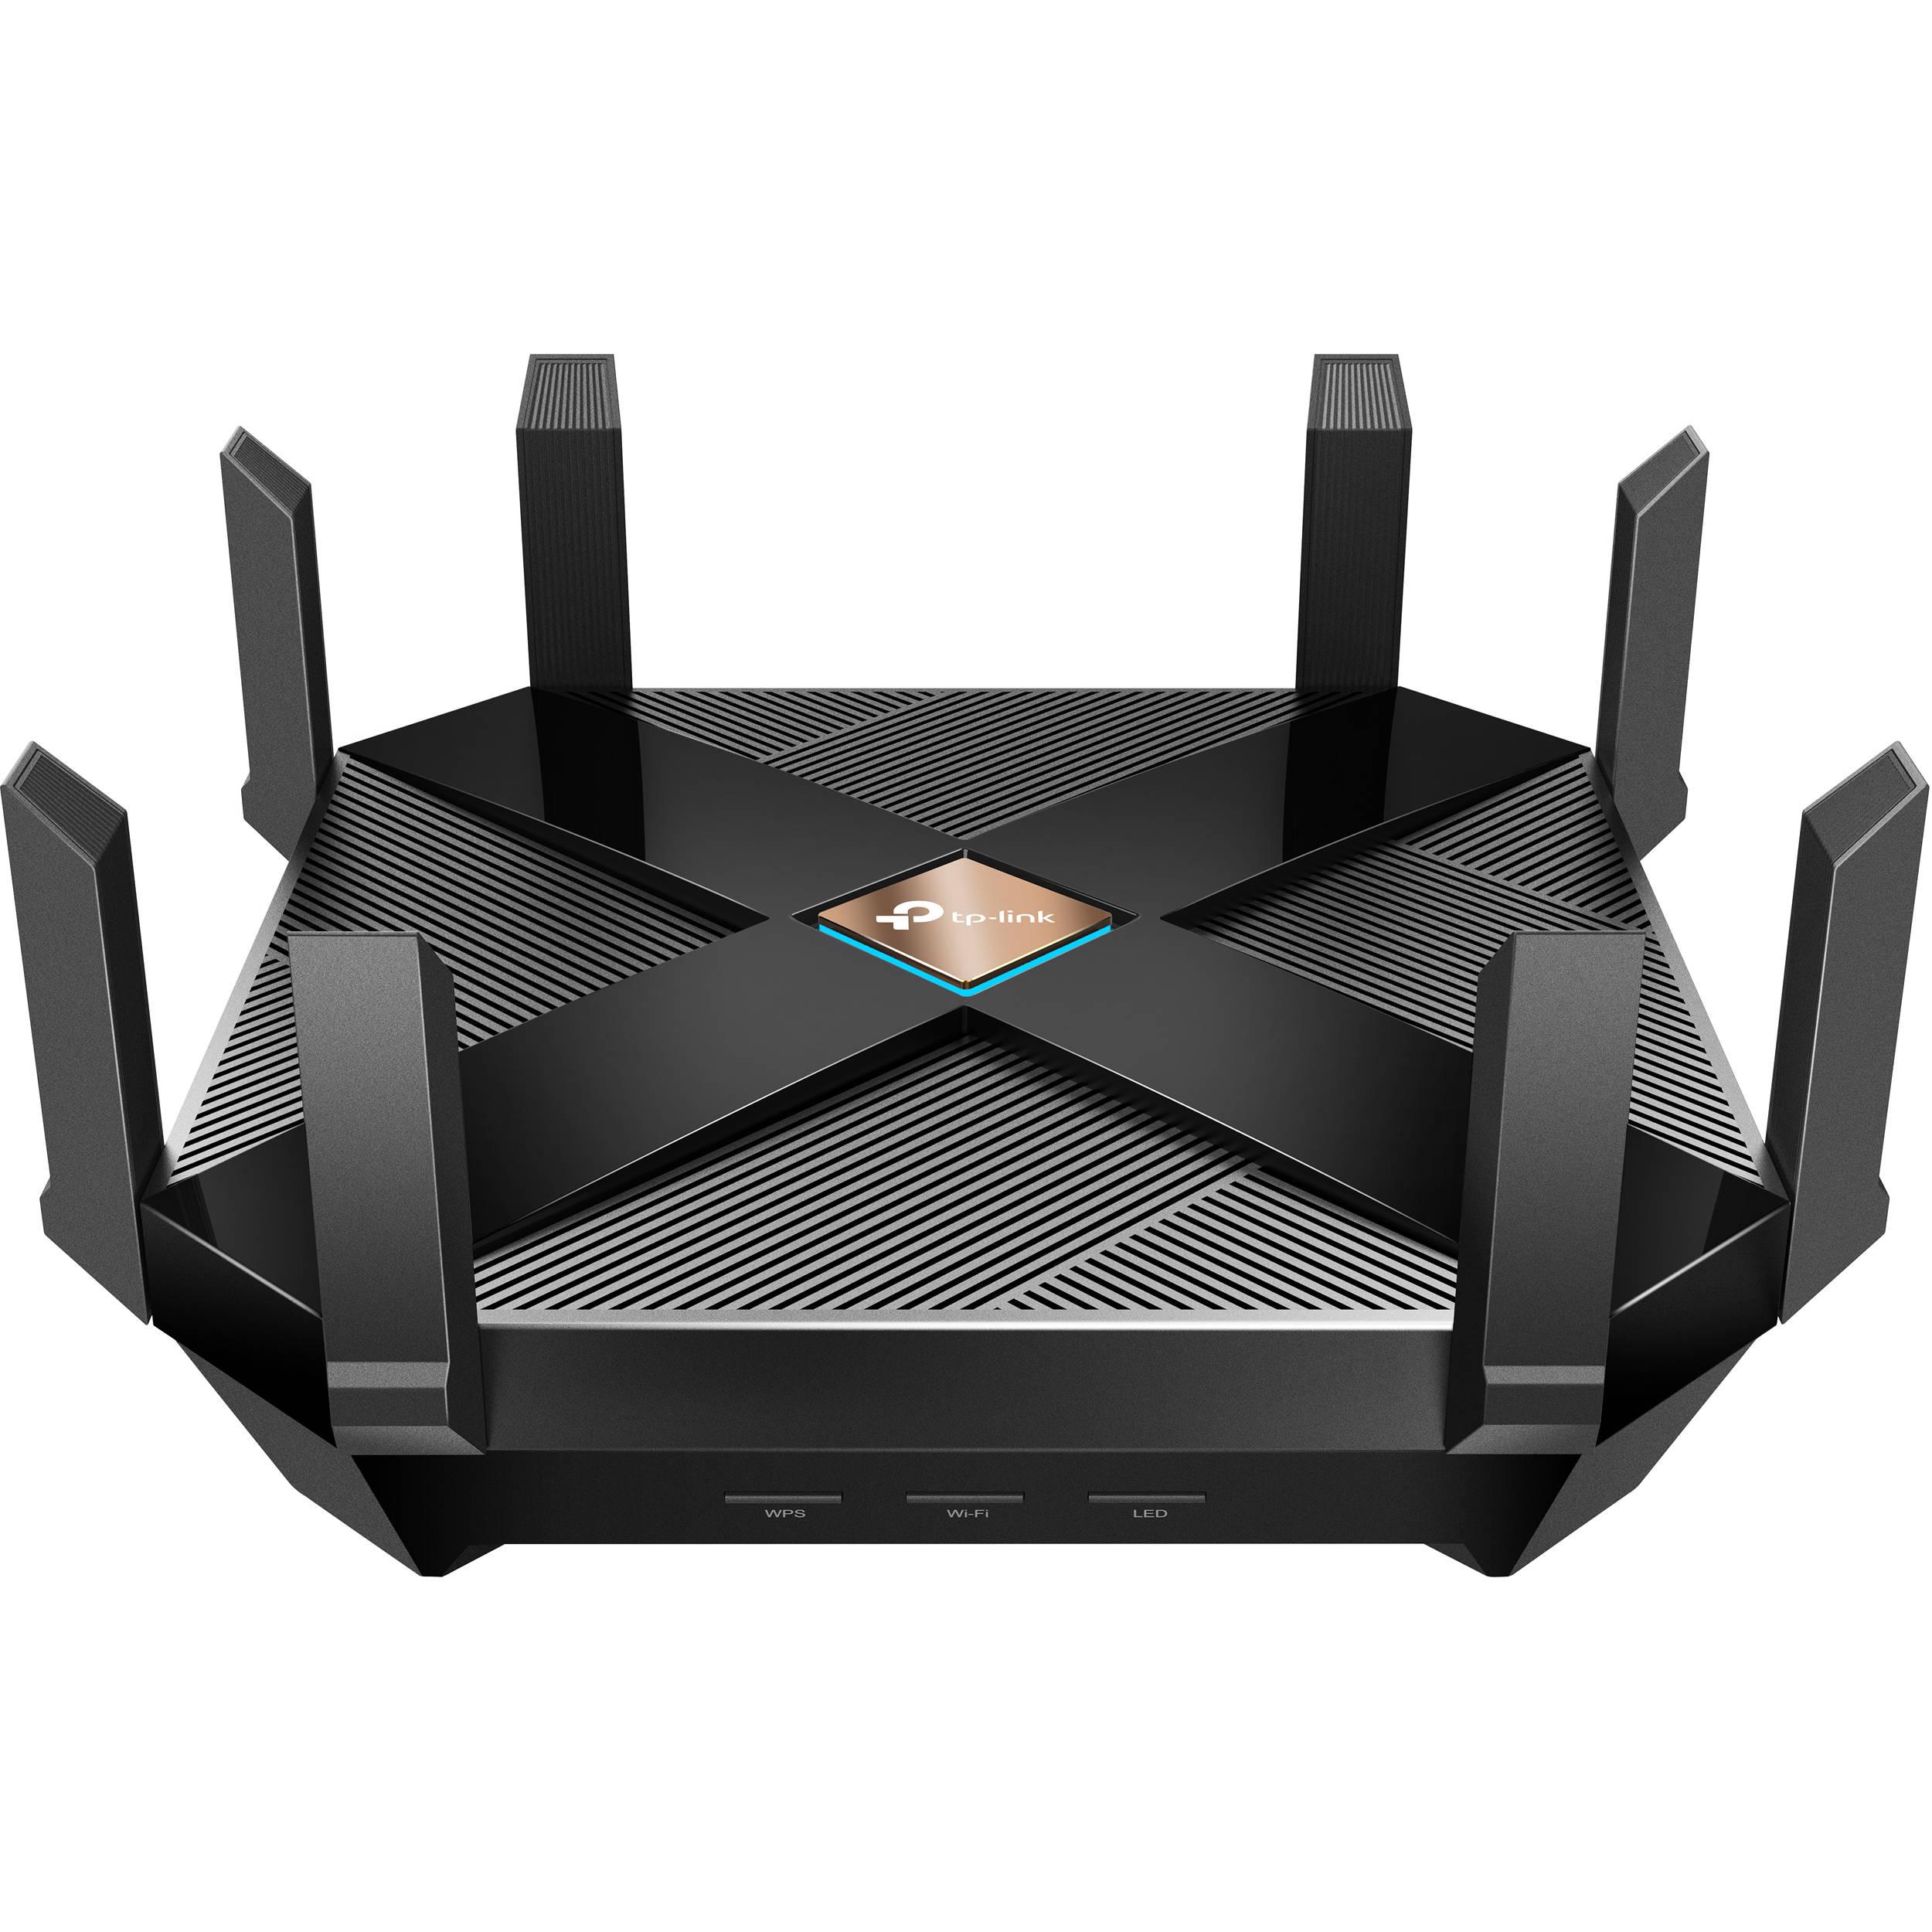 Tp Link Archer Ax6000 Wi Fi Router Archer Ax6000 B H Photo Video